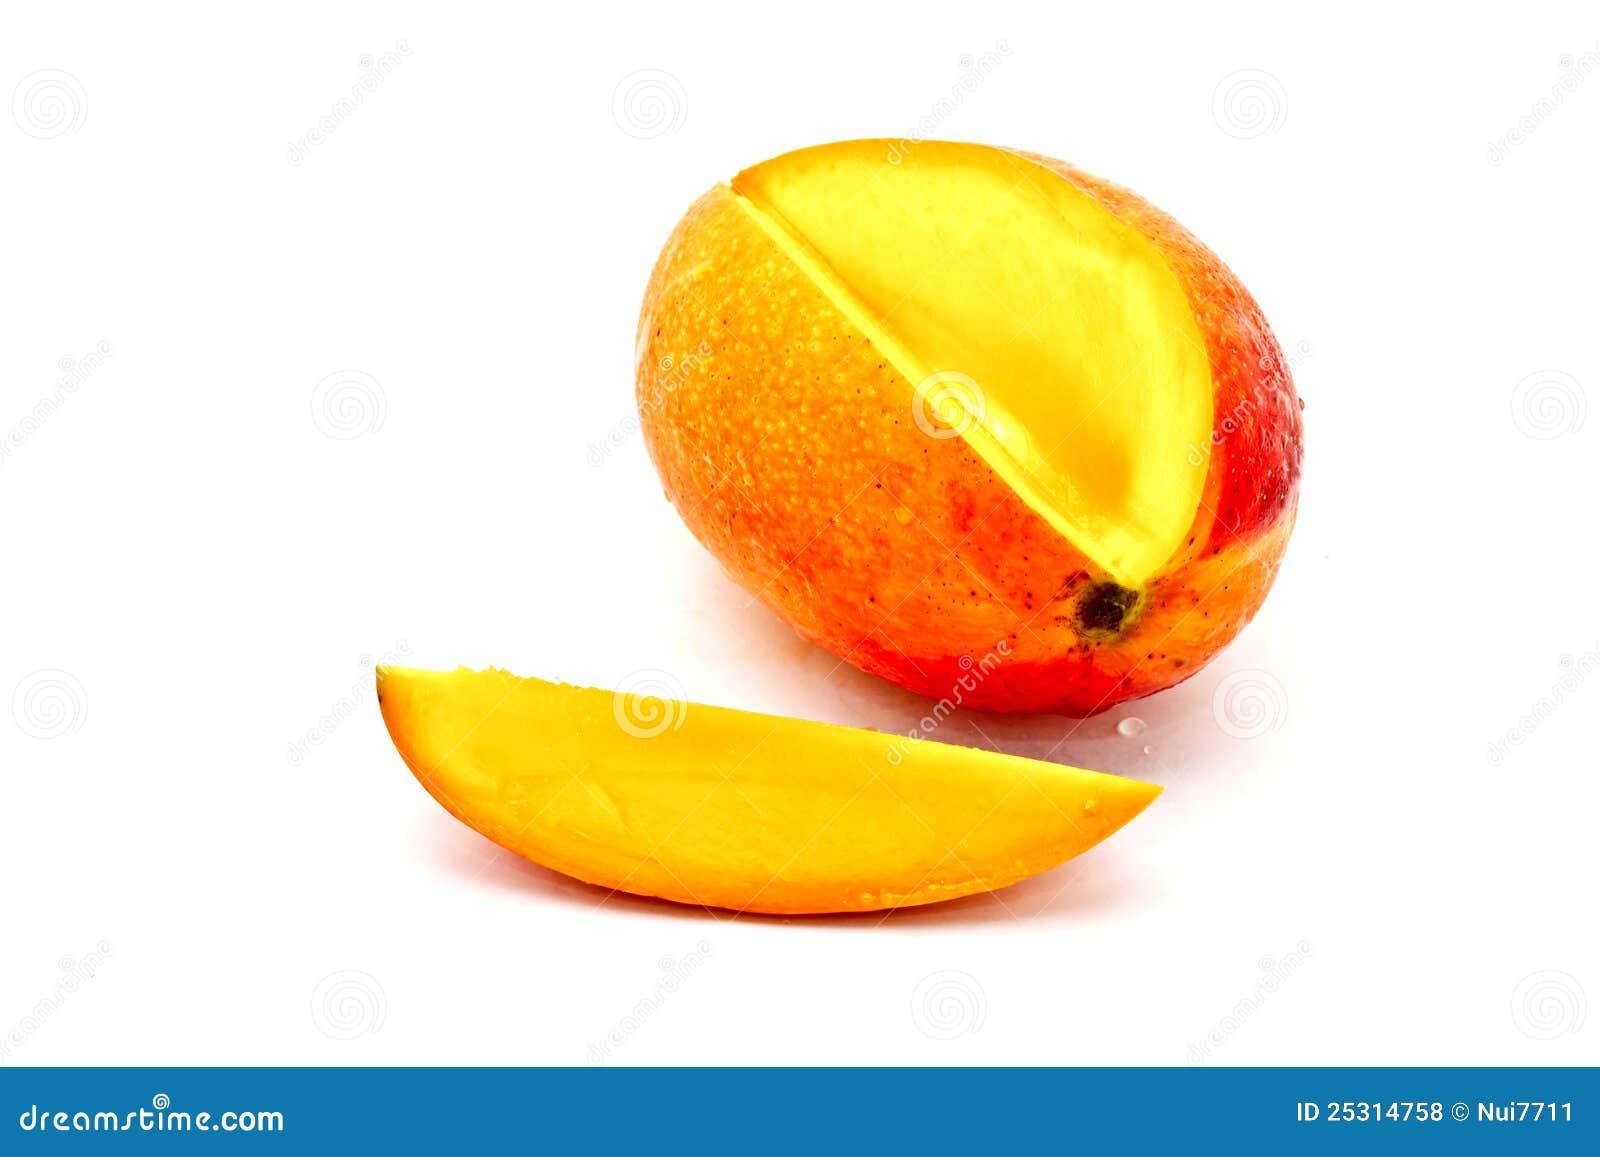 how to cut mango fruit